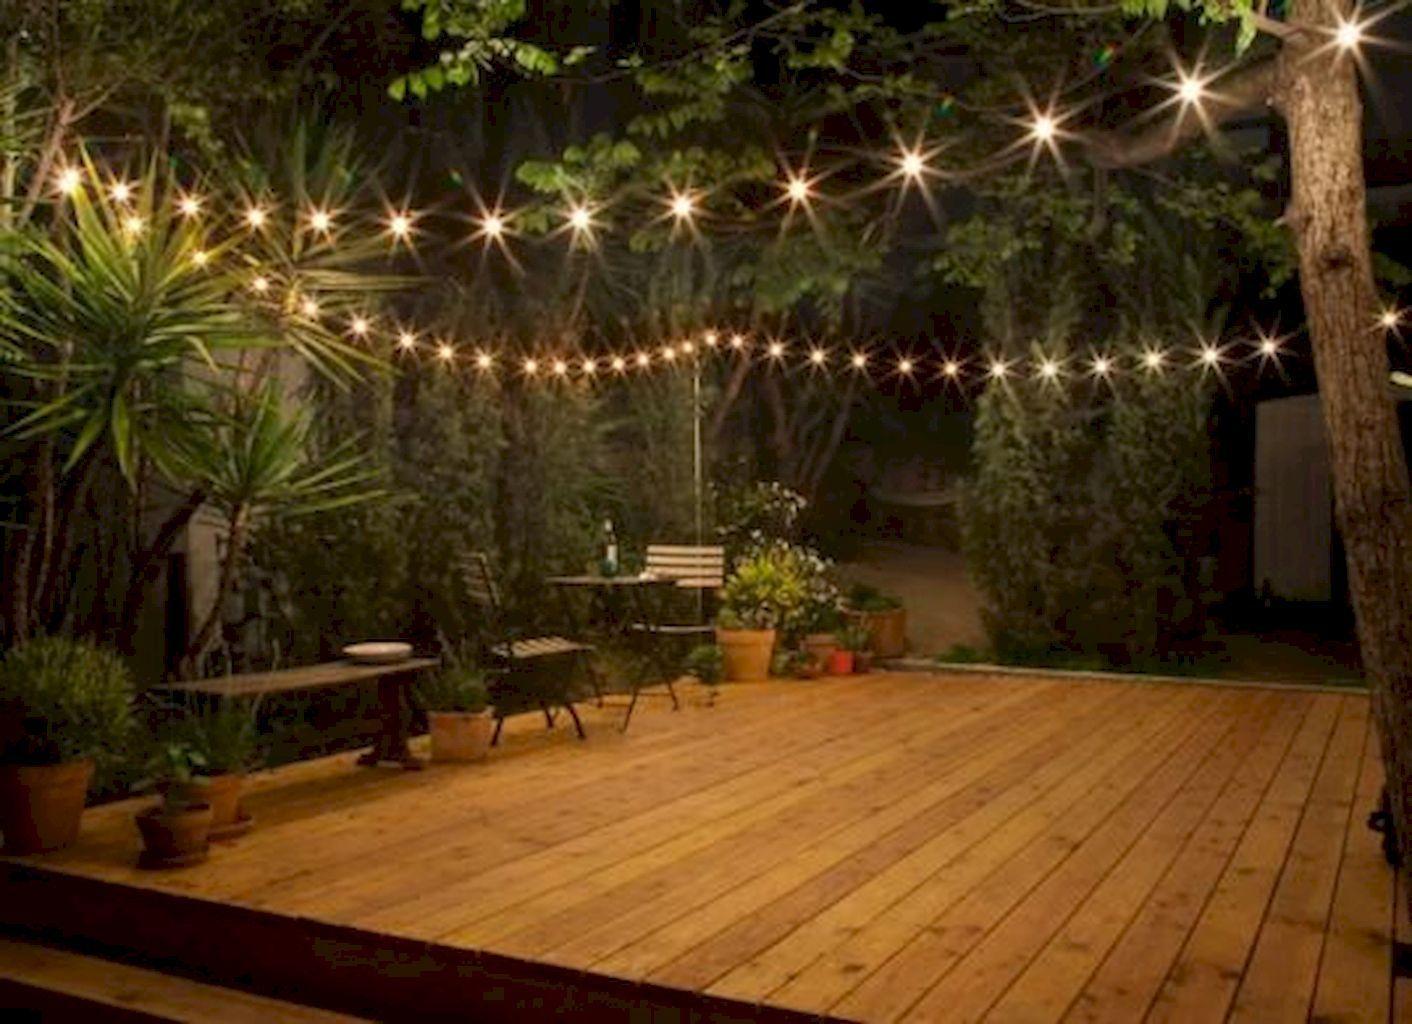 70 Simple and Fresh Small Backyard Garden Design Ideas | Backyard ...